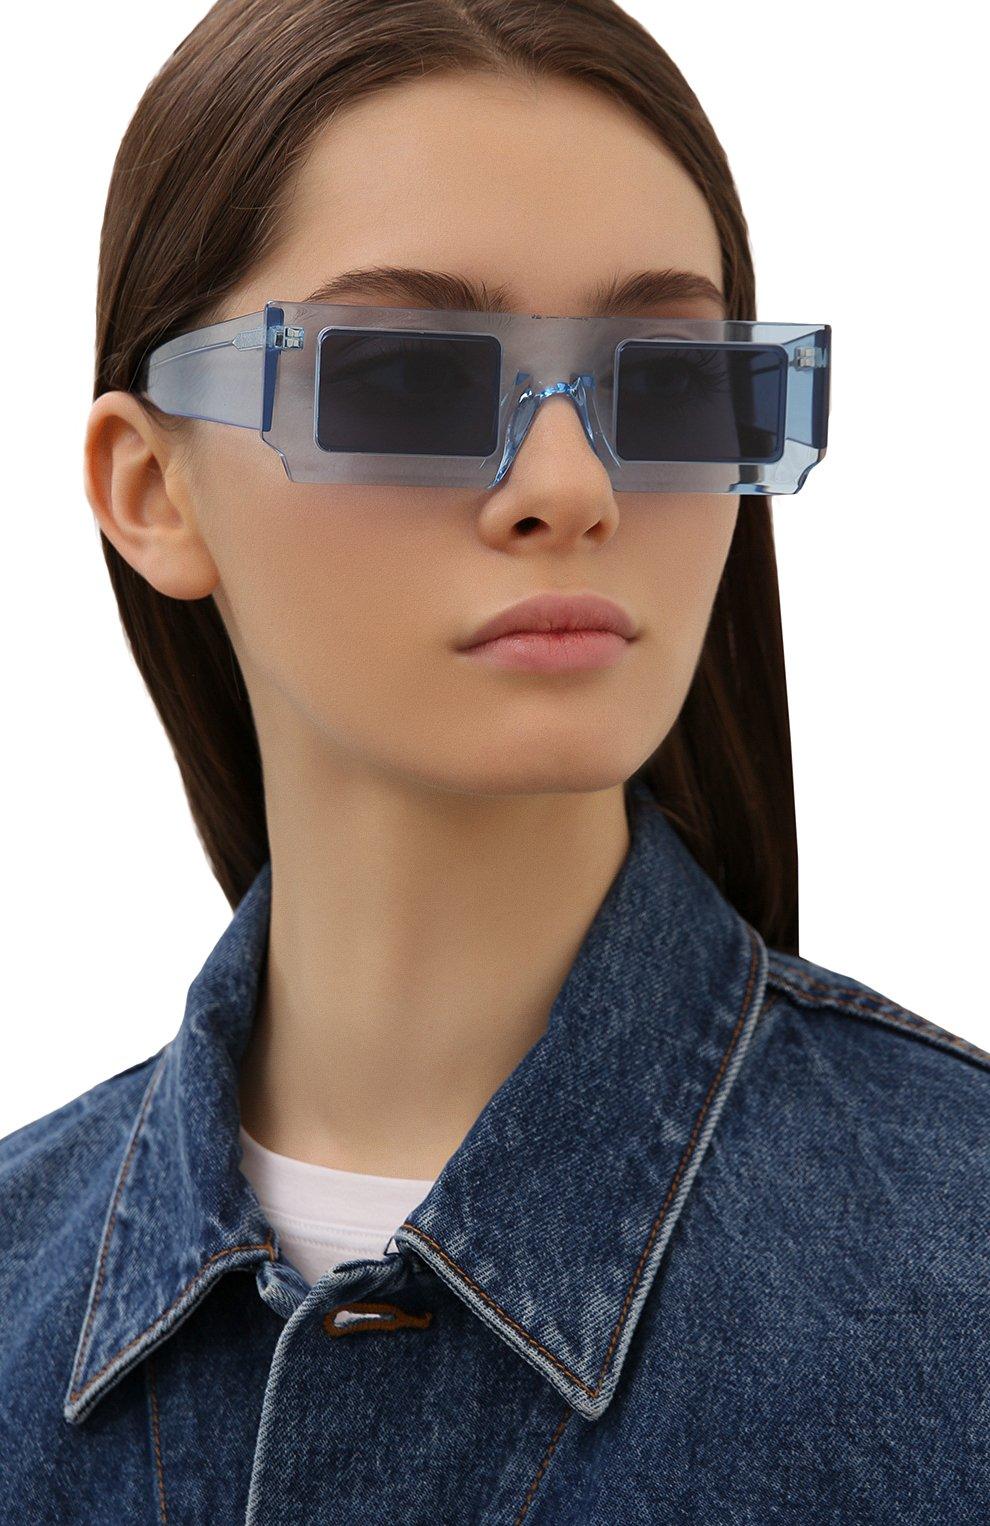 Женские солнцезащитные очки JACQUEMUS голубого цвета, арт. LES LUNETTES S0LEIL SHADE 0F BLUE | Фото 2